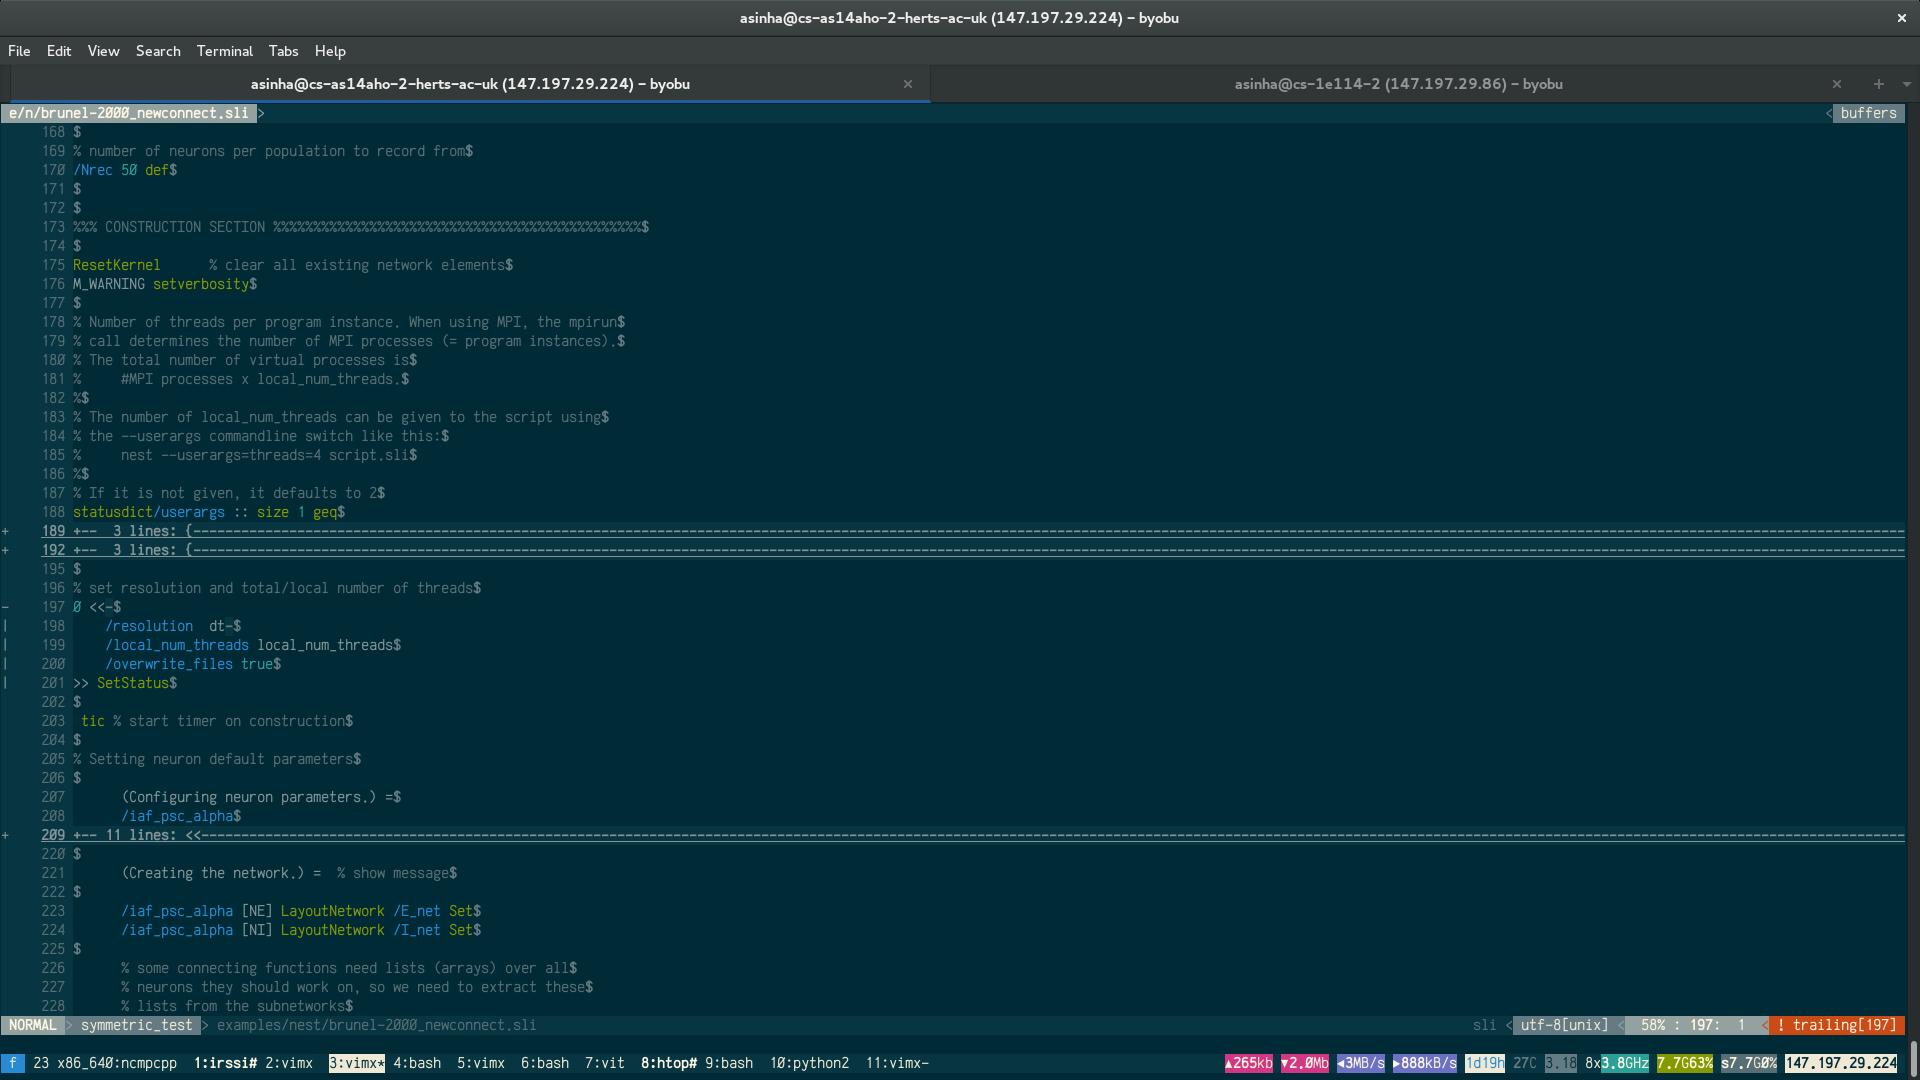 Screenshot showing SLI syntax highlighting in Vim